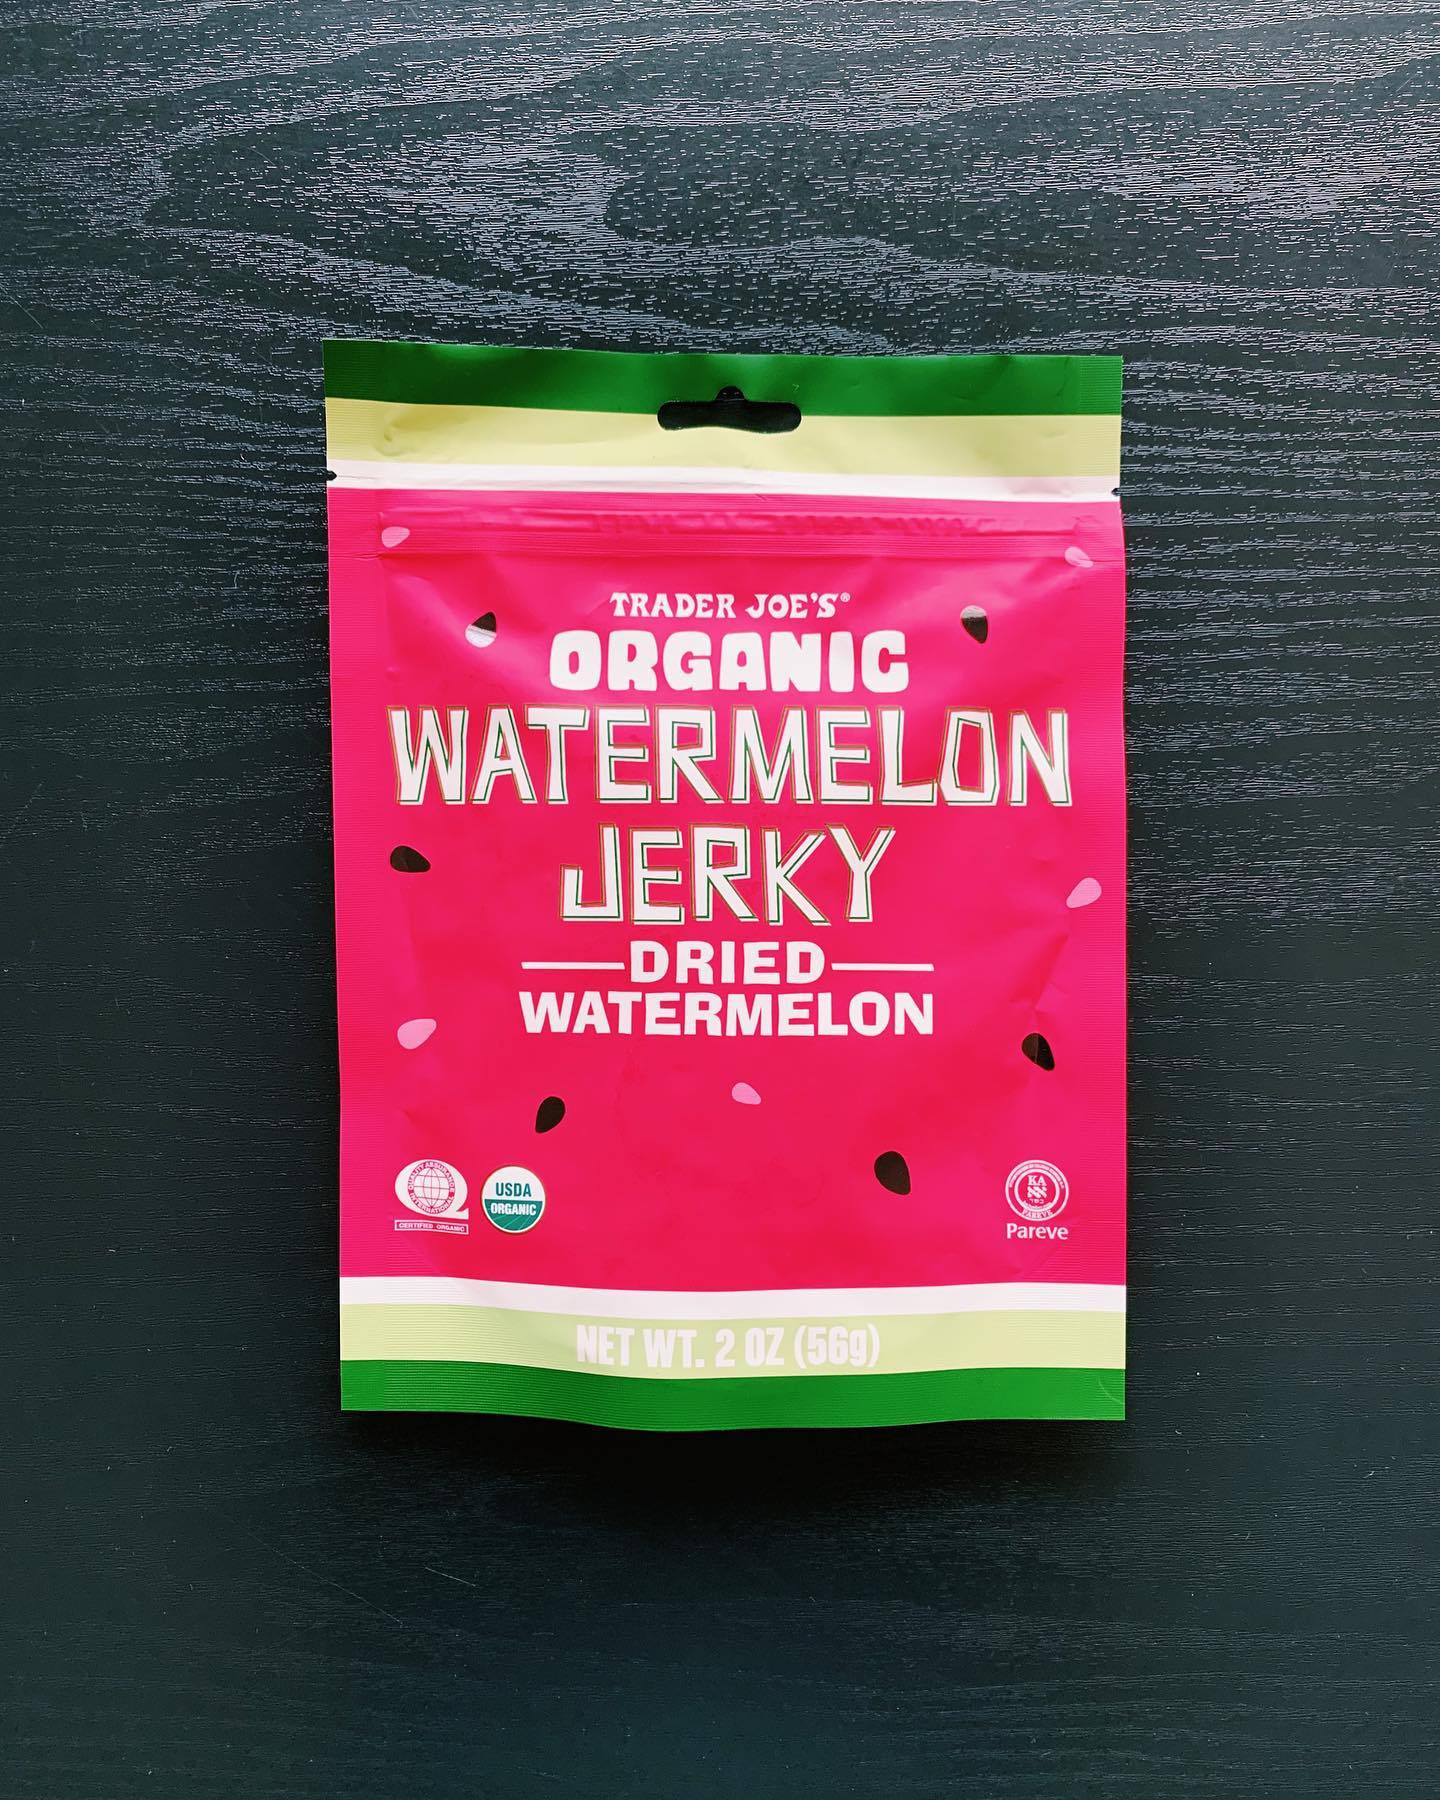 Watermelon Jerky: 7.5/10